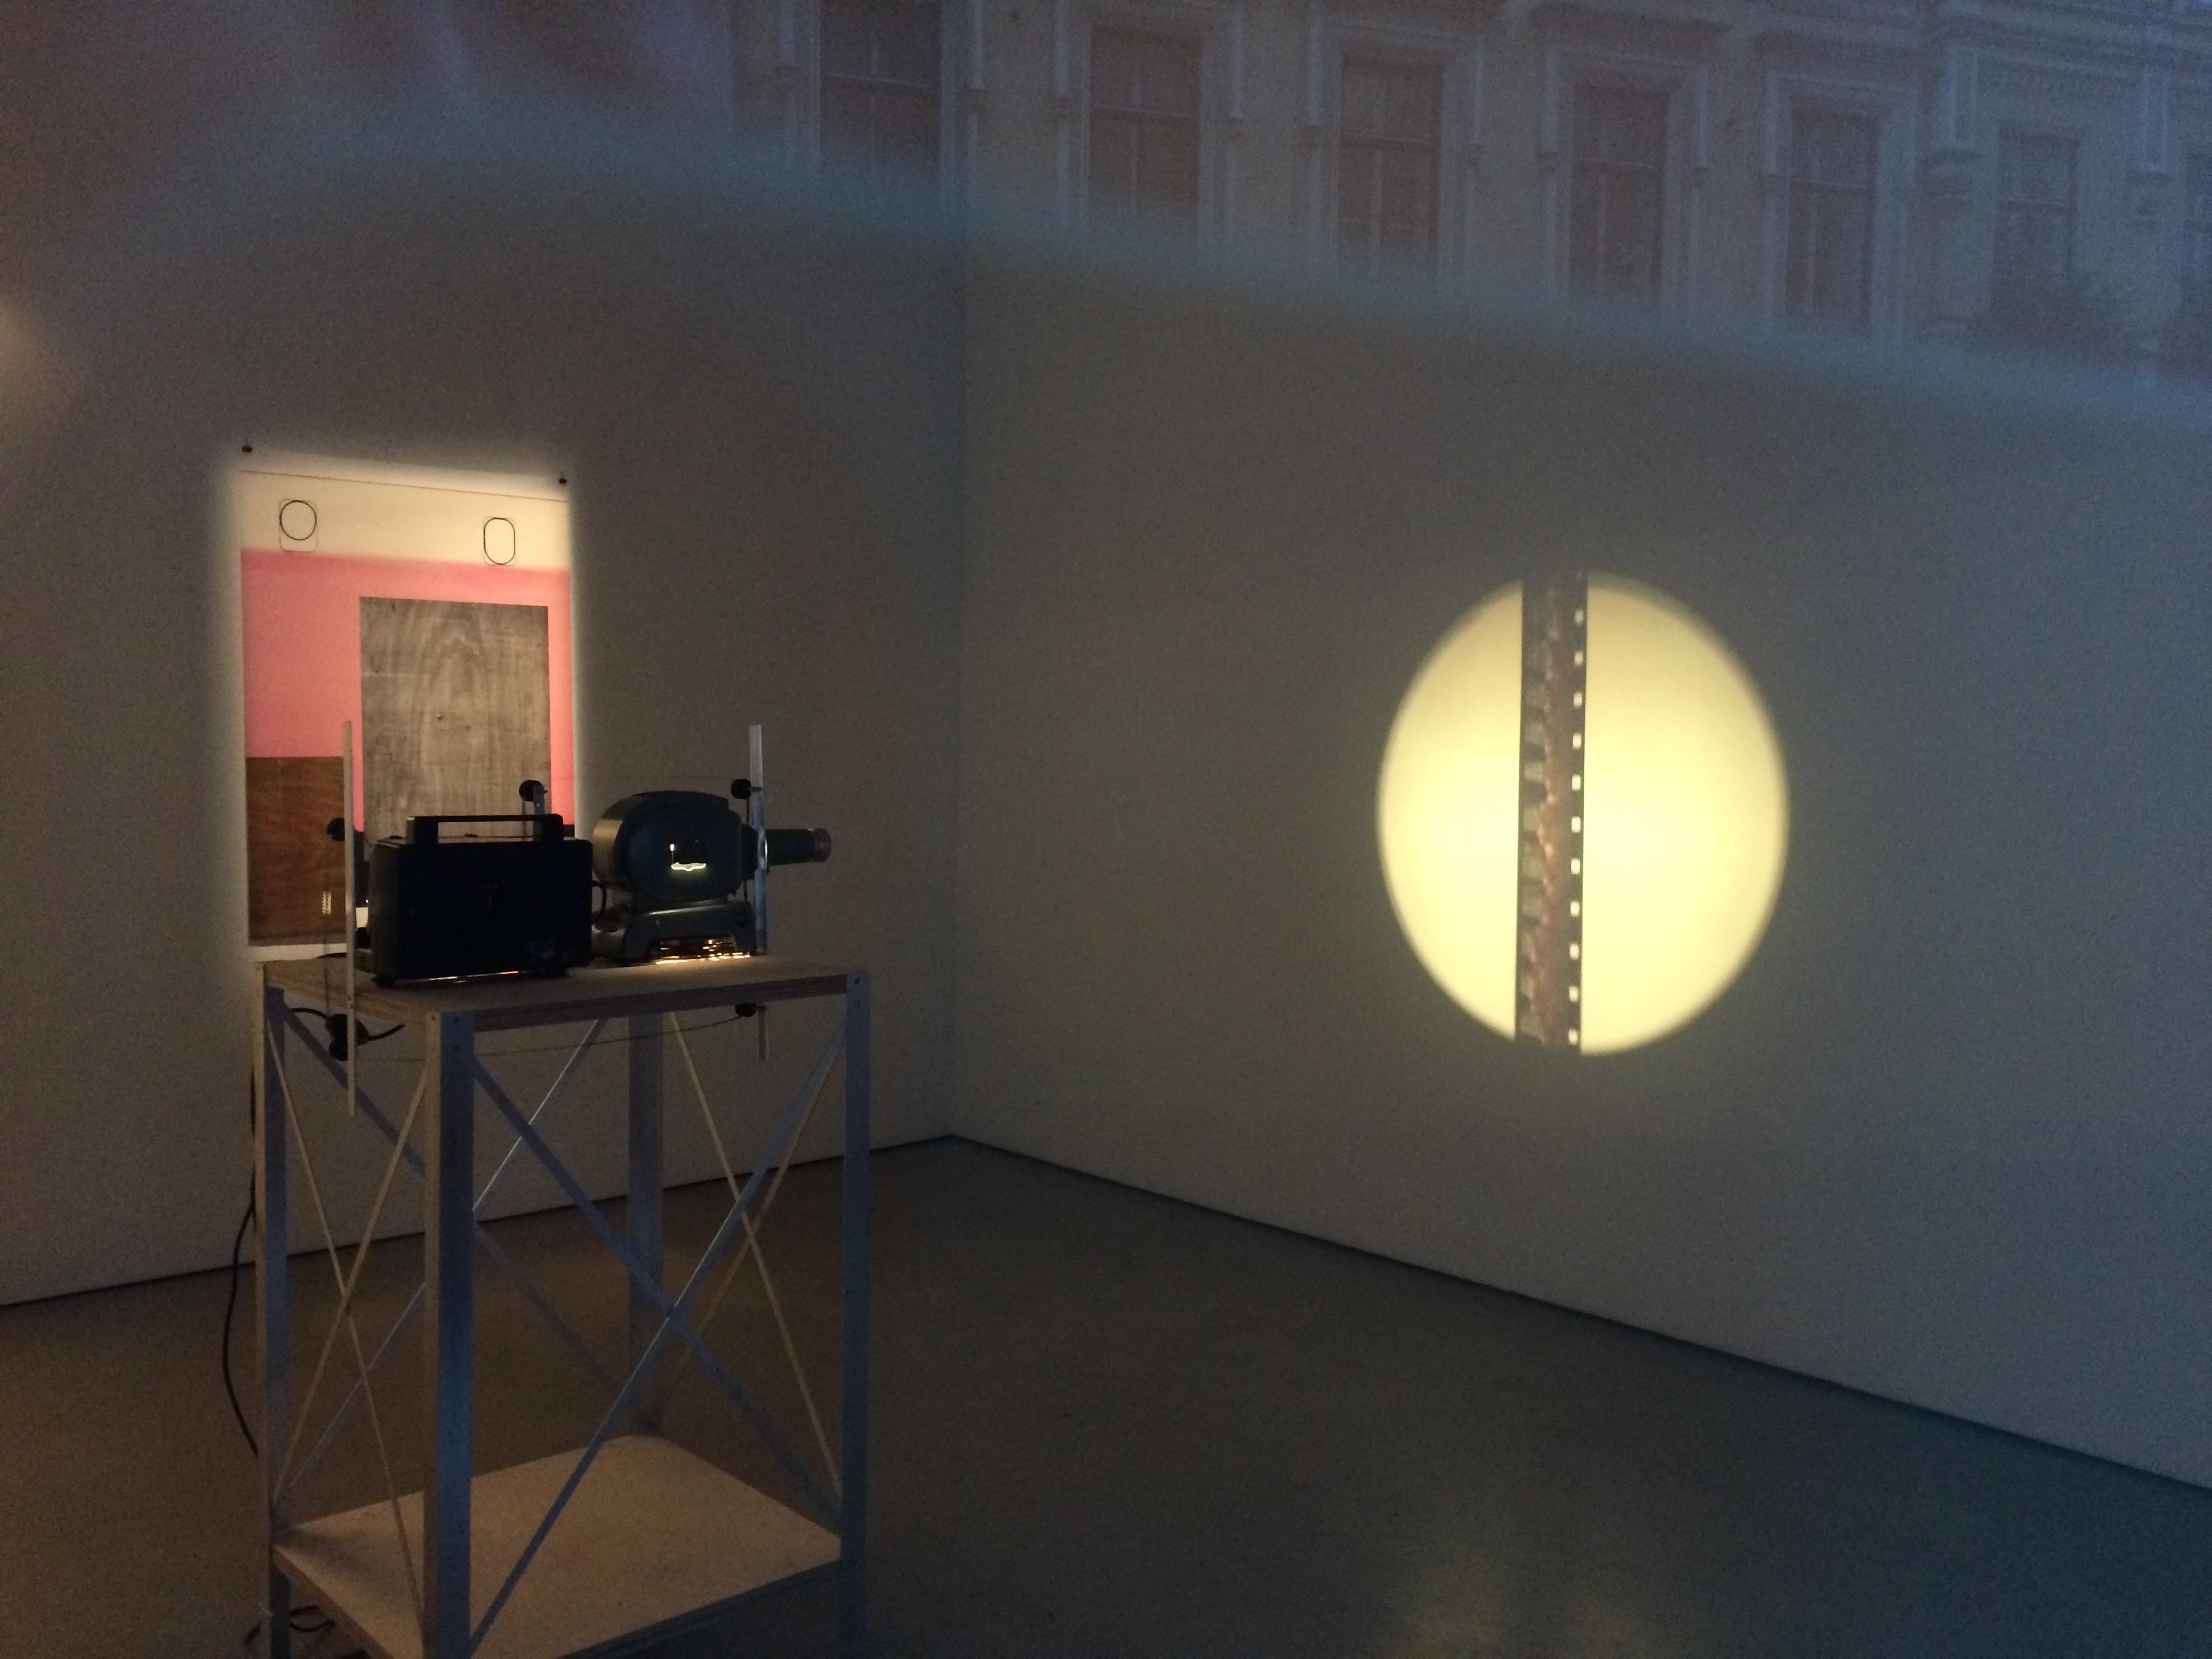 Super 8 & Slide Projector: Wolfgang Plöger @ Georg Kargl BOX